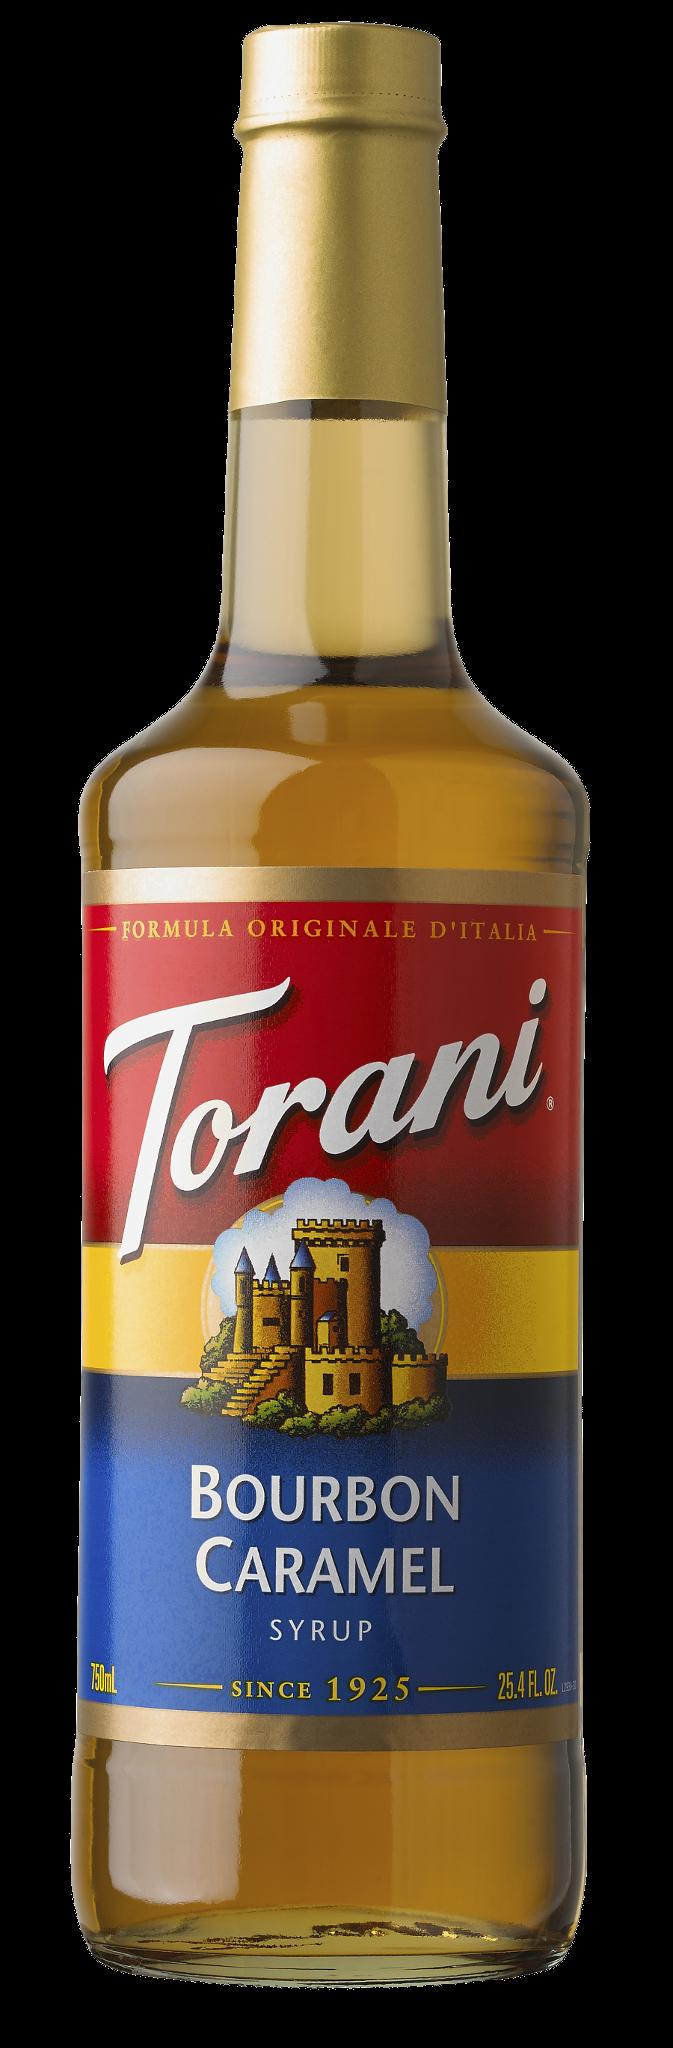 Bourbon Caramel Syrup image